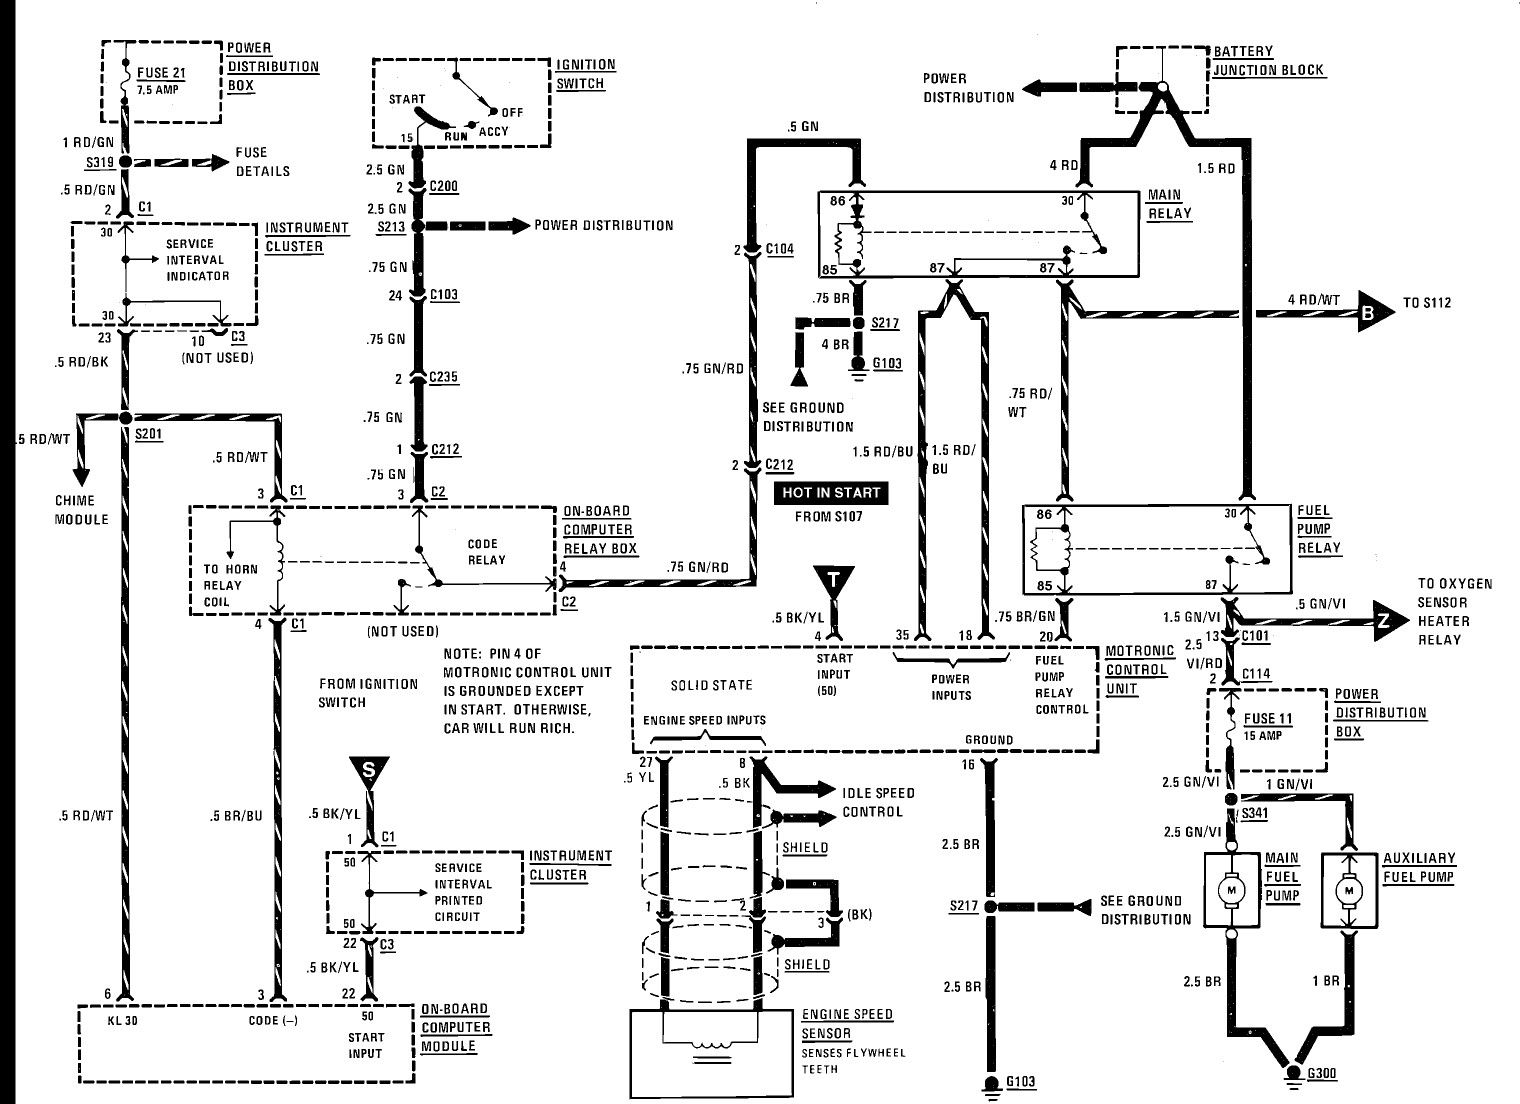 medium resolution of bmw x5 wiring diagram 3 bmw x5 e53 3d pinterest bmw bmw x5 i rh pinterest com bmw x5 stereo wiring diagram bmw x5 trailer wiring diagram